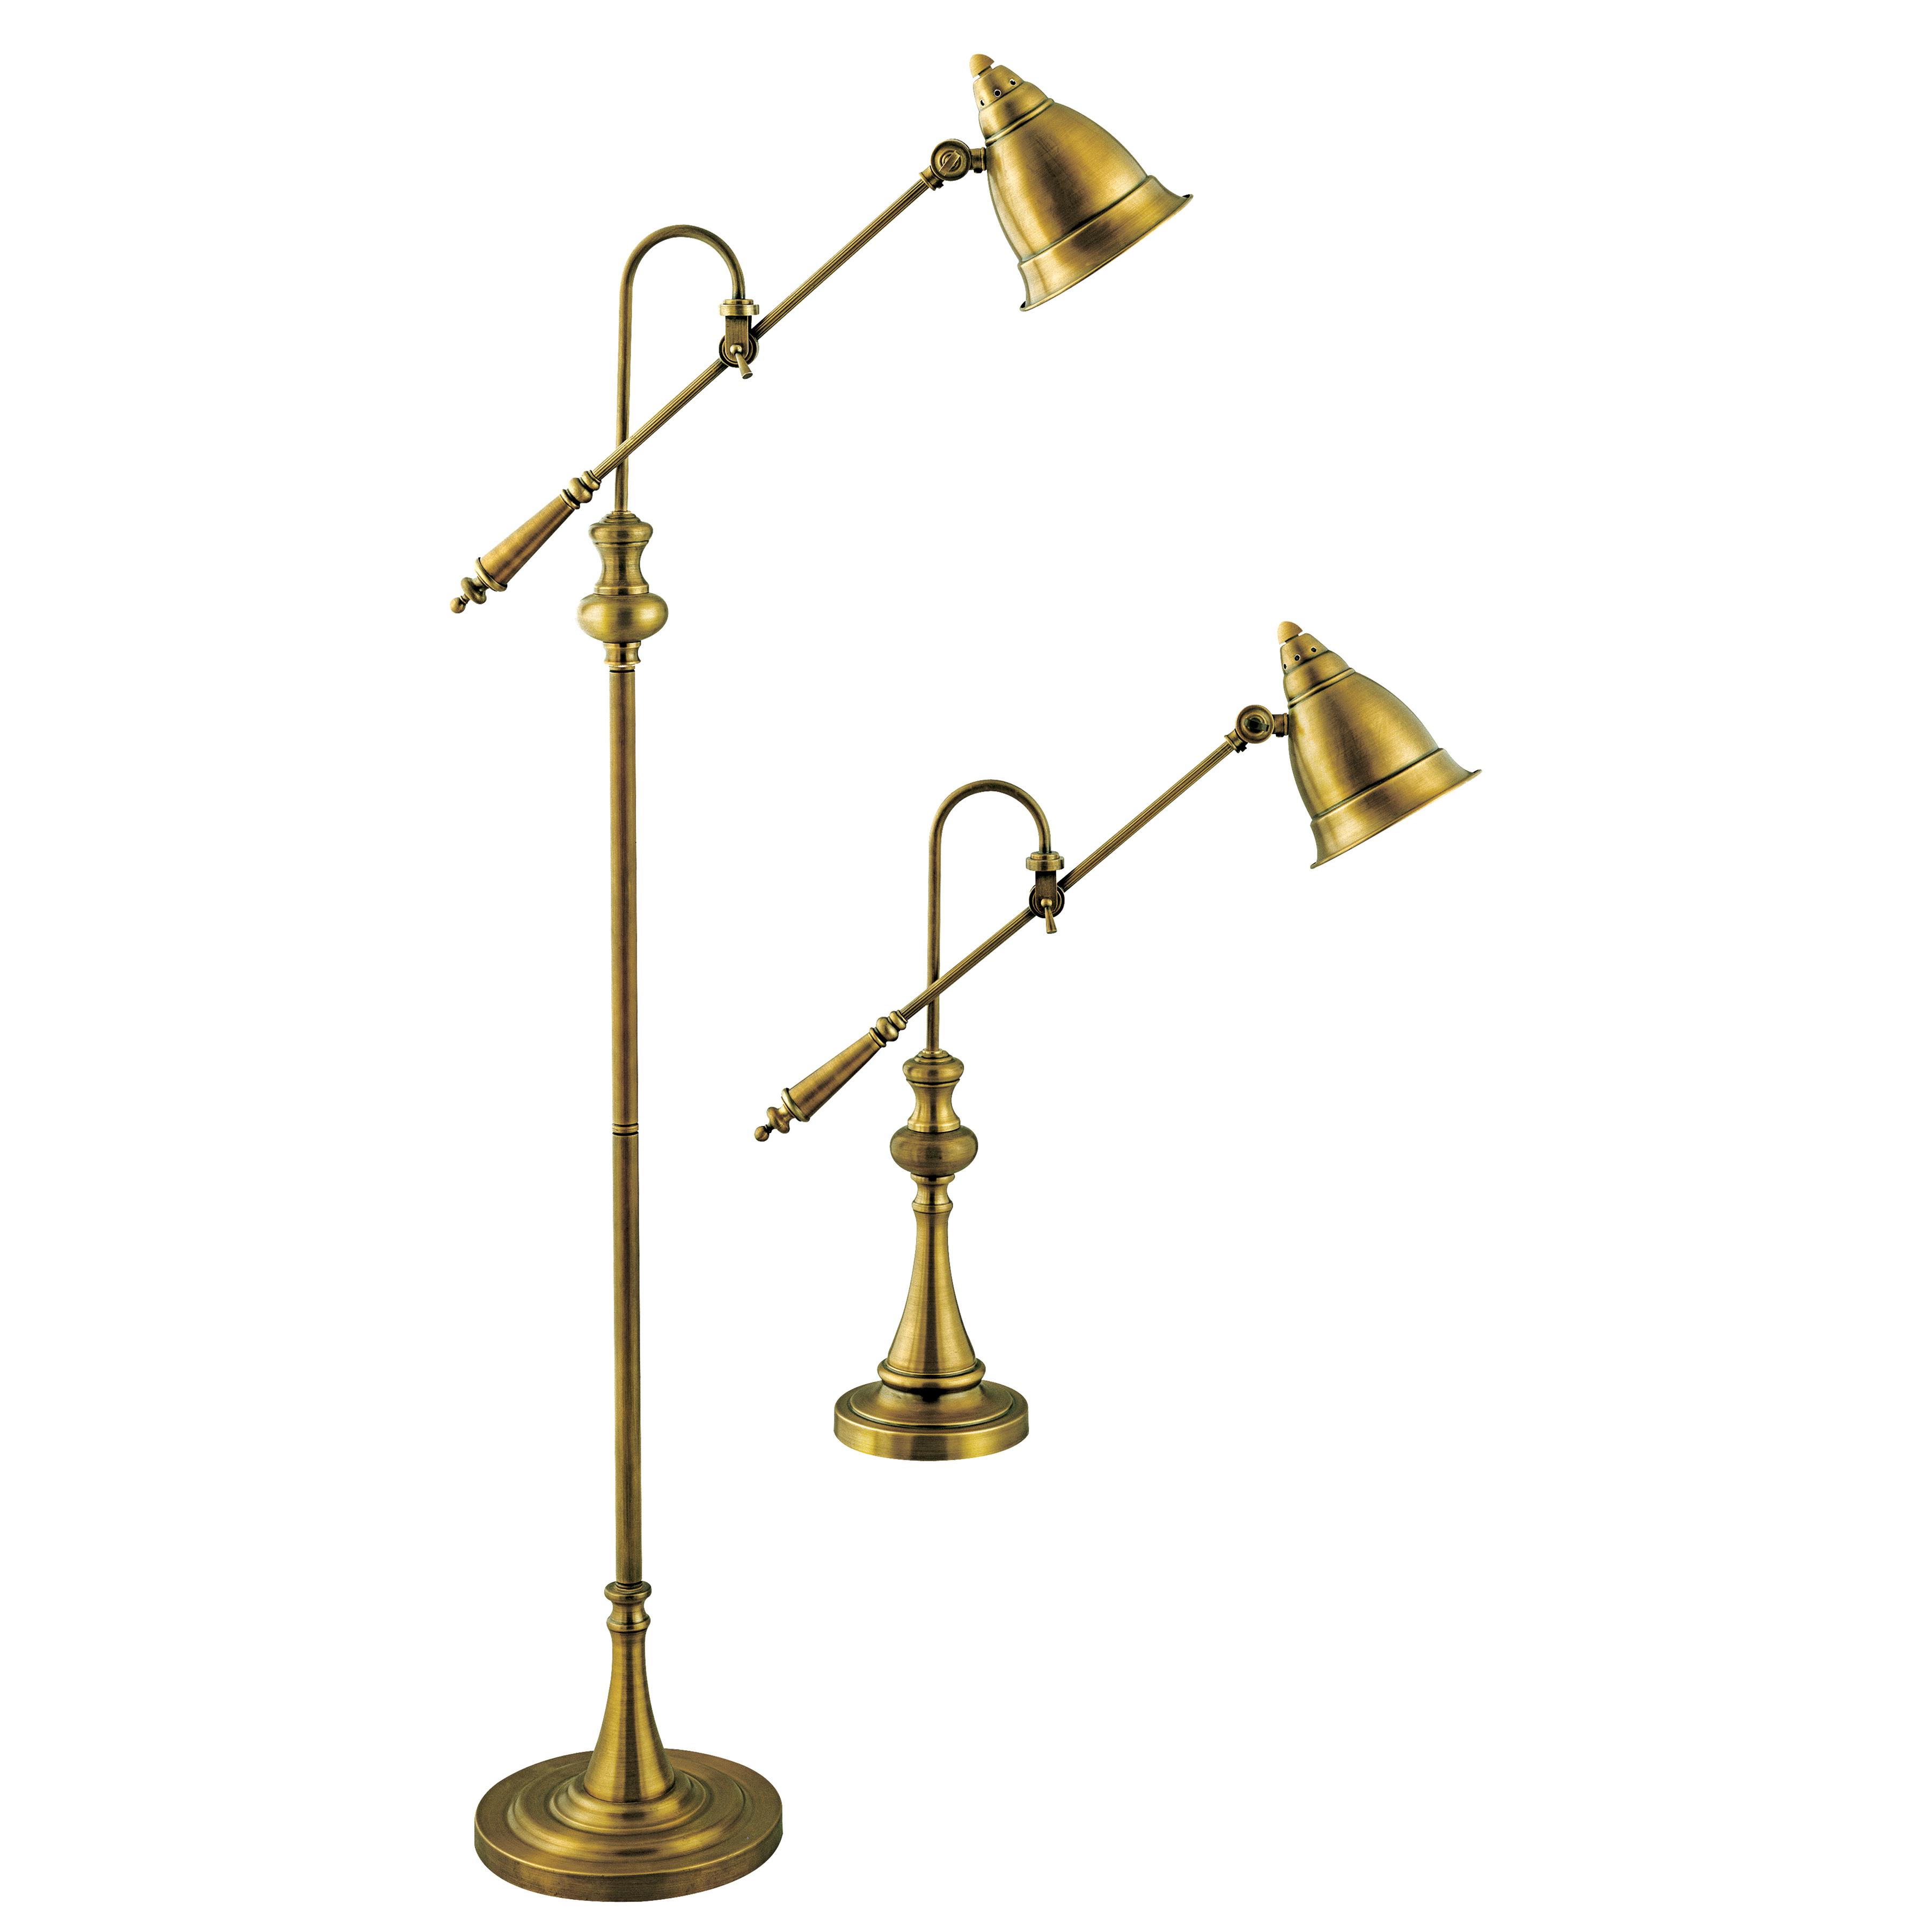 Stein World Watson Adjustable Pharmacy Lamps (1 Floor Lamp/1 Table Lamp)